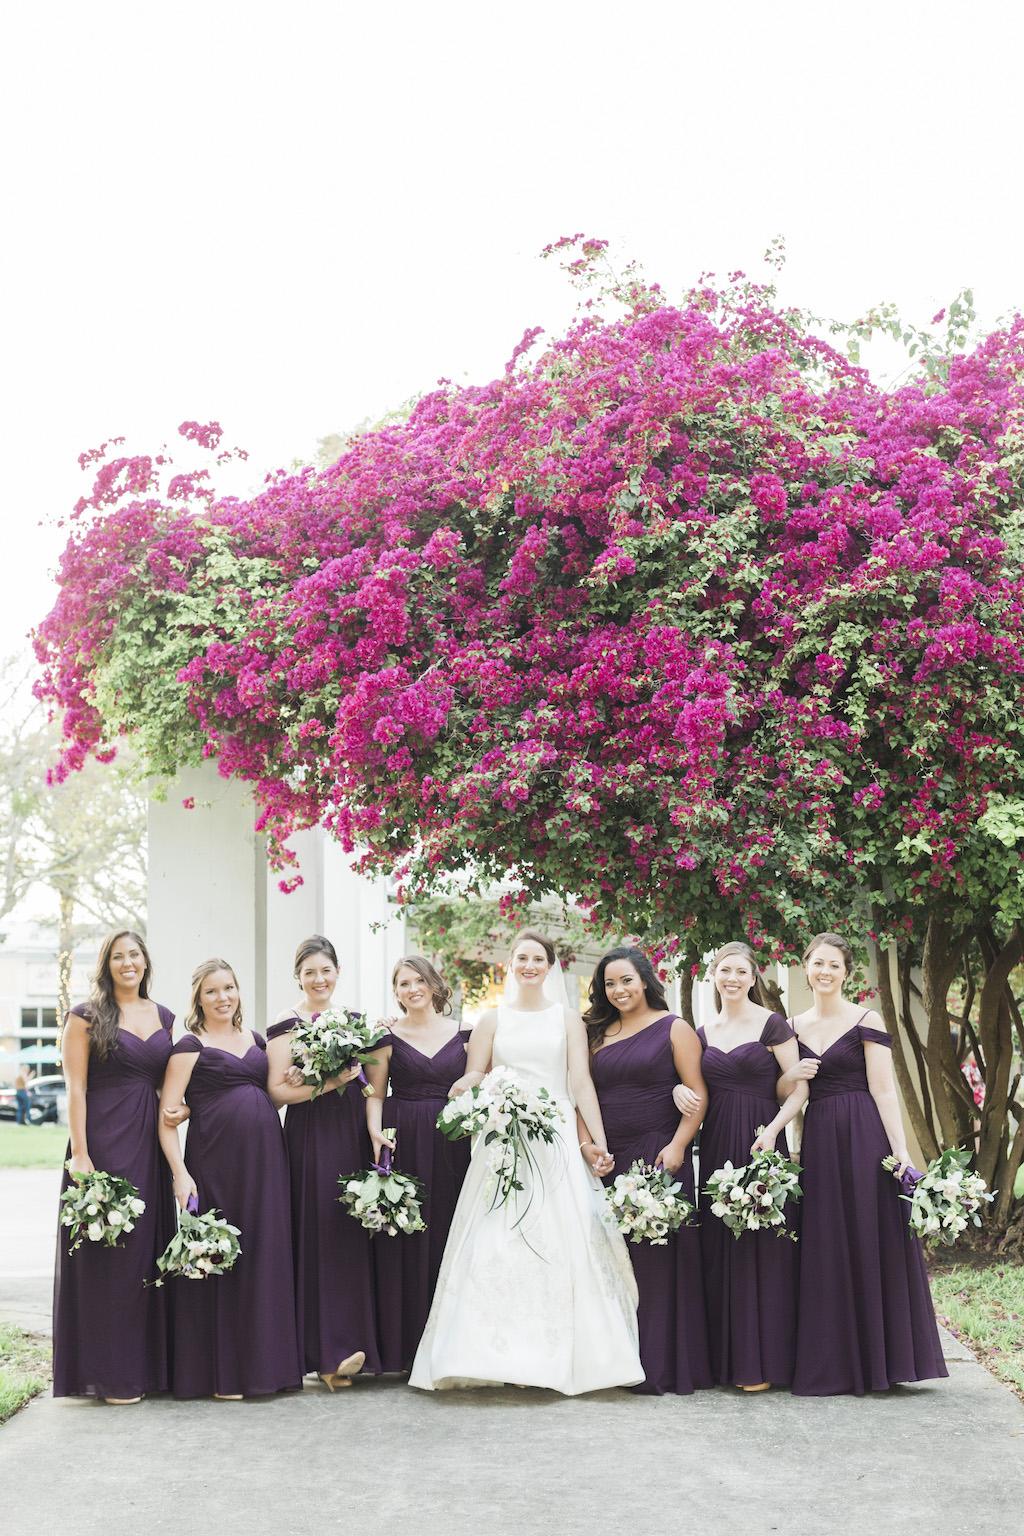 Tampa Bay Bride and Bridesmaids Portrait, Bridesmaids in Long Purple Dresses | Downtown St. Pete Straub Park